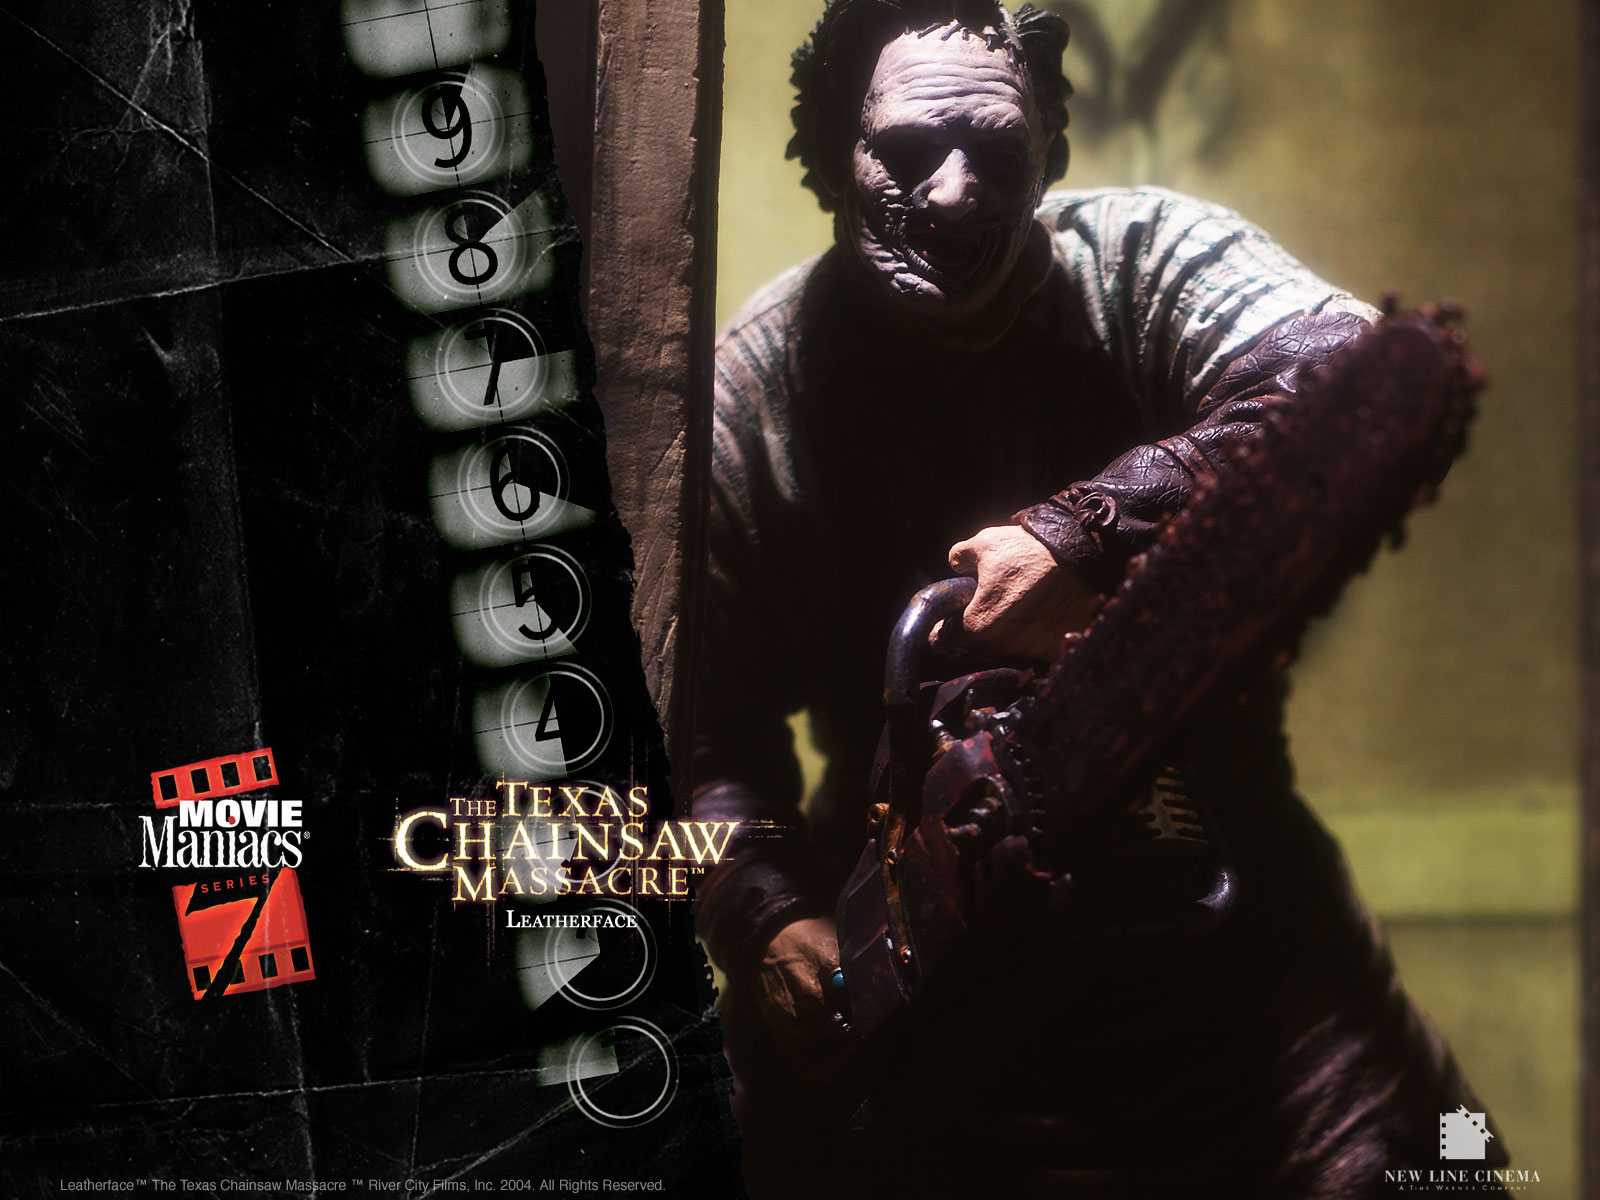 figuresworld > movies & t.v. > the texas chainsaw massacre